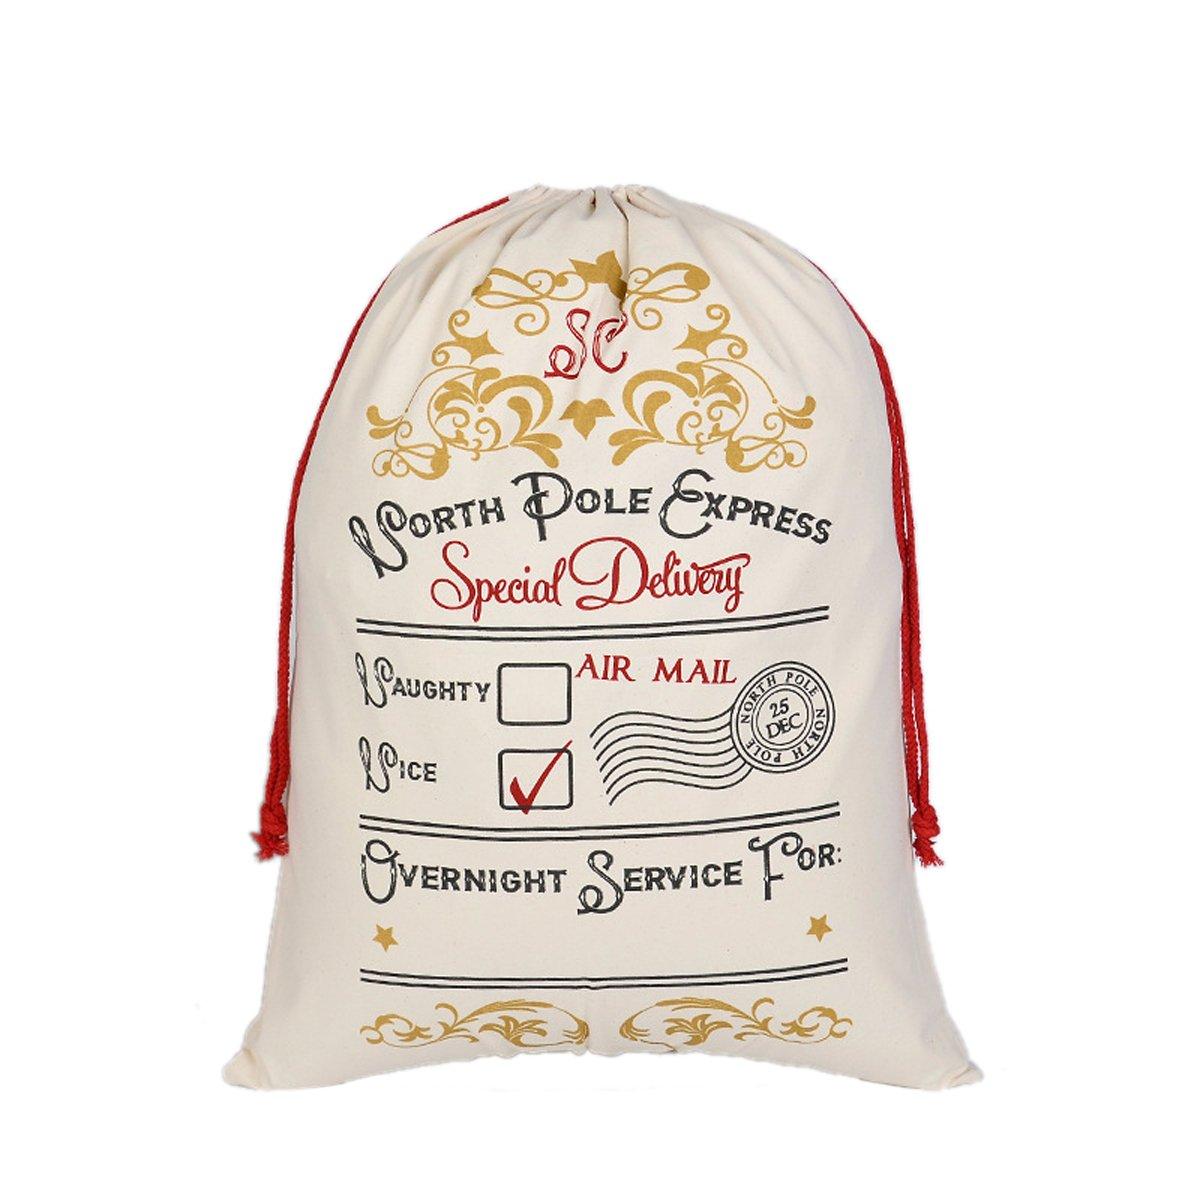 ZAloha Canvas Santa Bag Cotton Sack with Drawstring Personalized Name for Holiday Presents